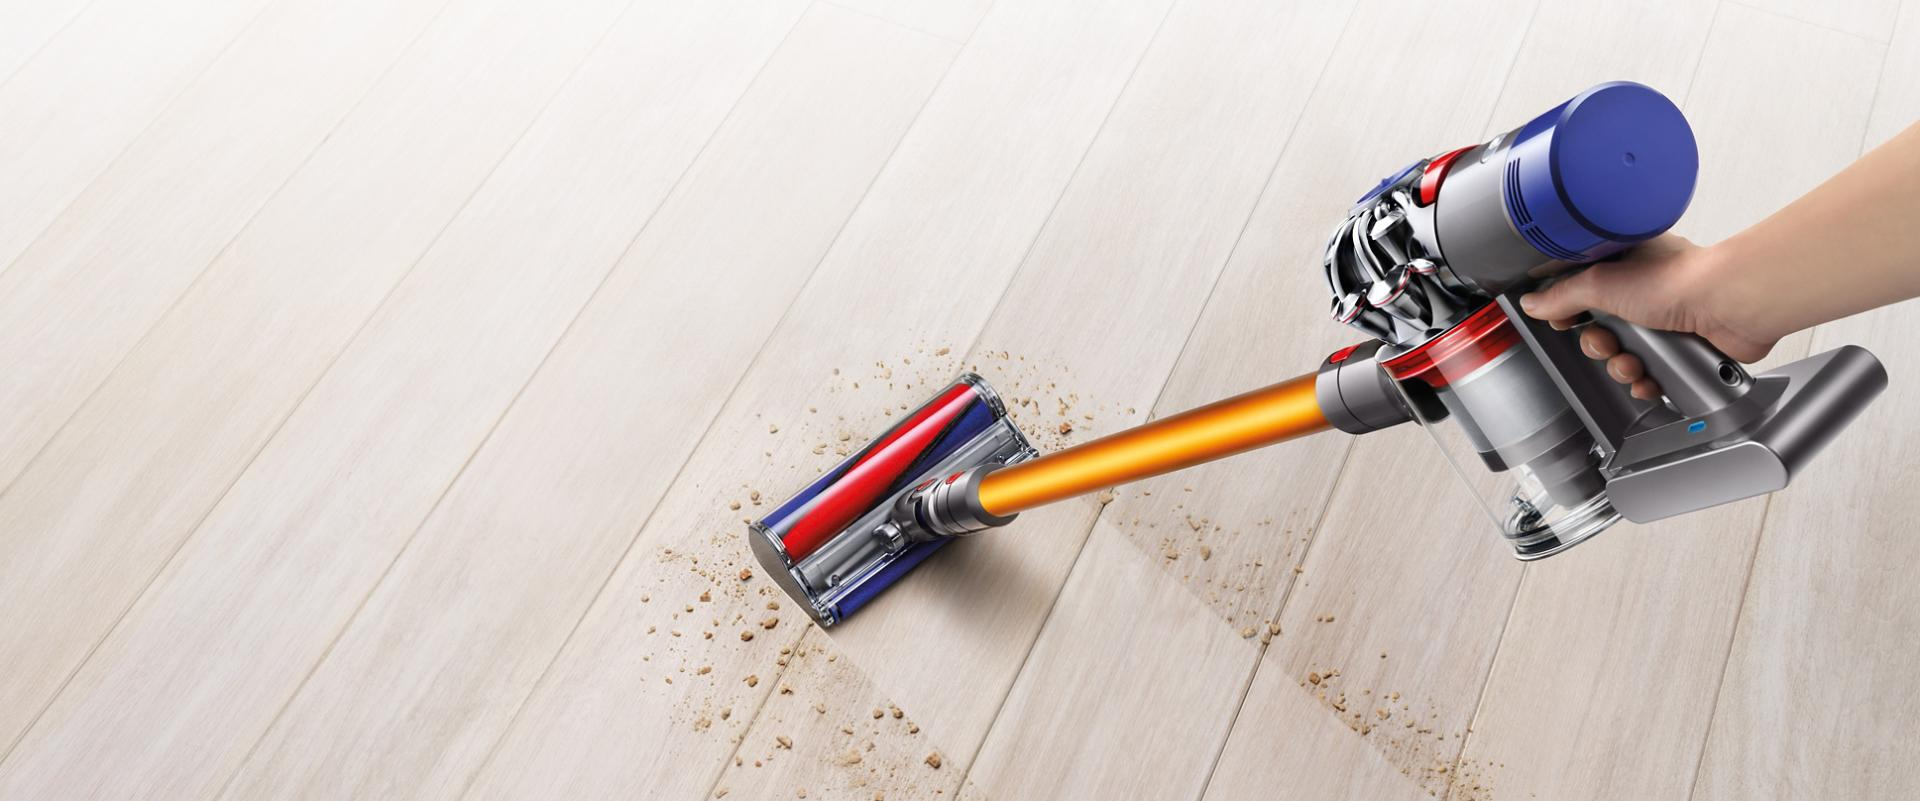 Dyson V8 vacuum cleaner picking up debris from carpet